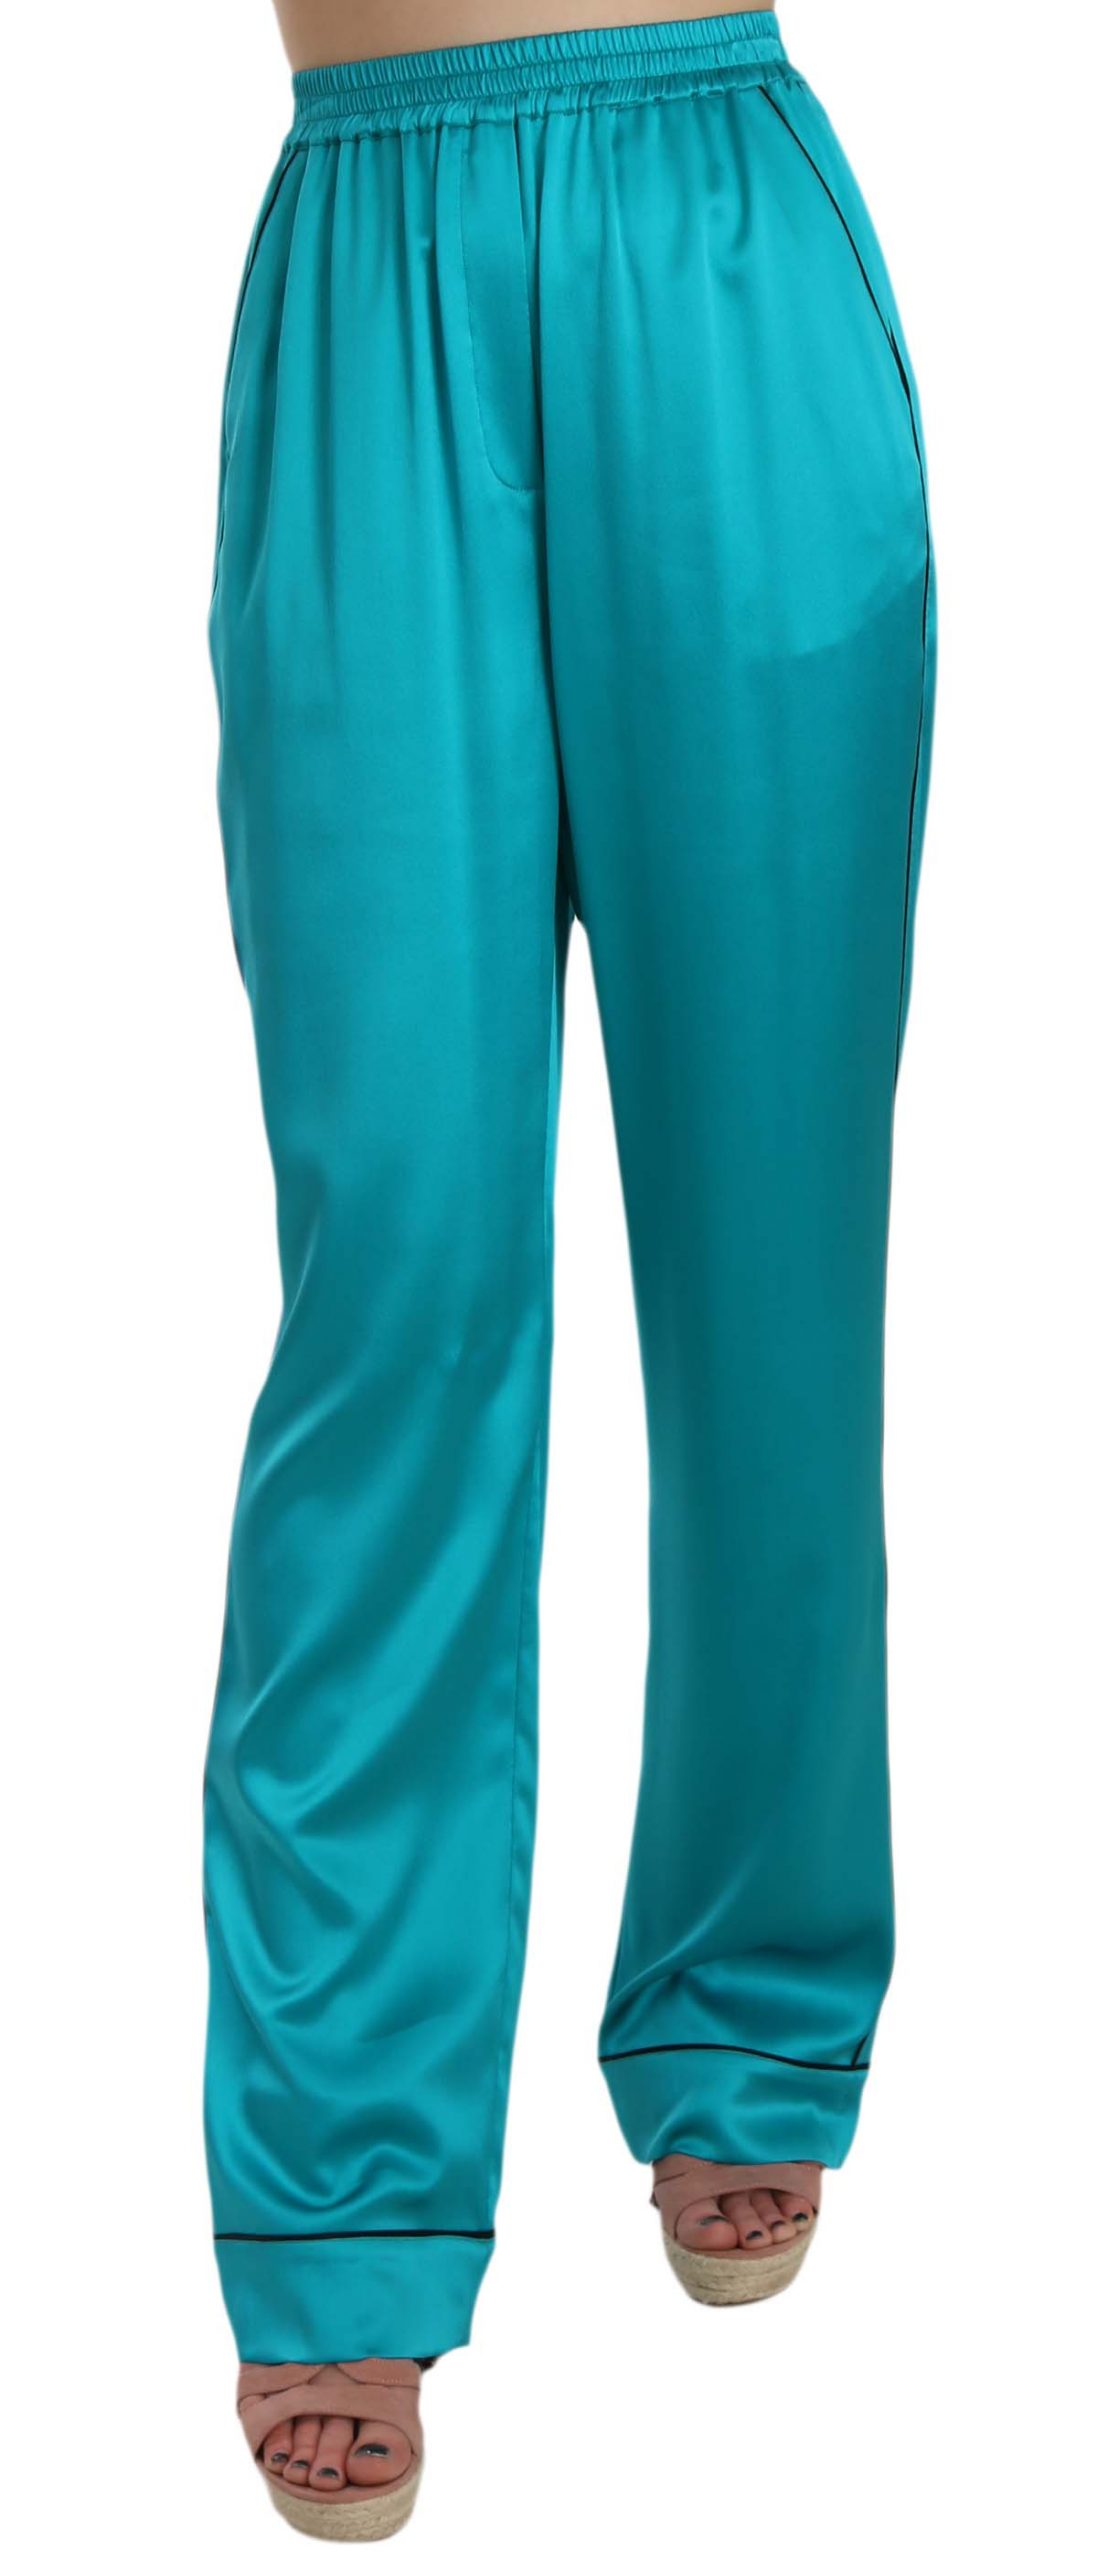 Dolce & Gabbana Women's Silk Stretch Trouser Blue BYX1328 - IT40|S